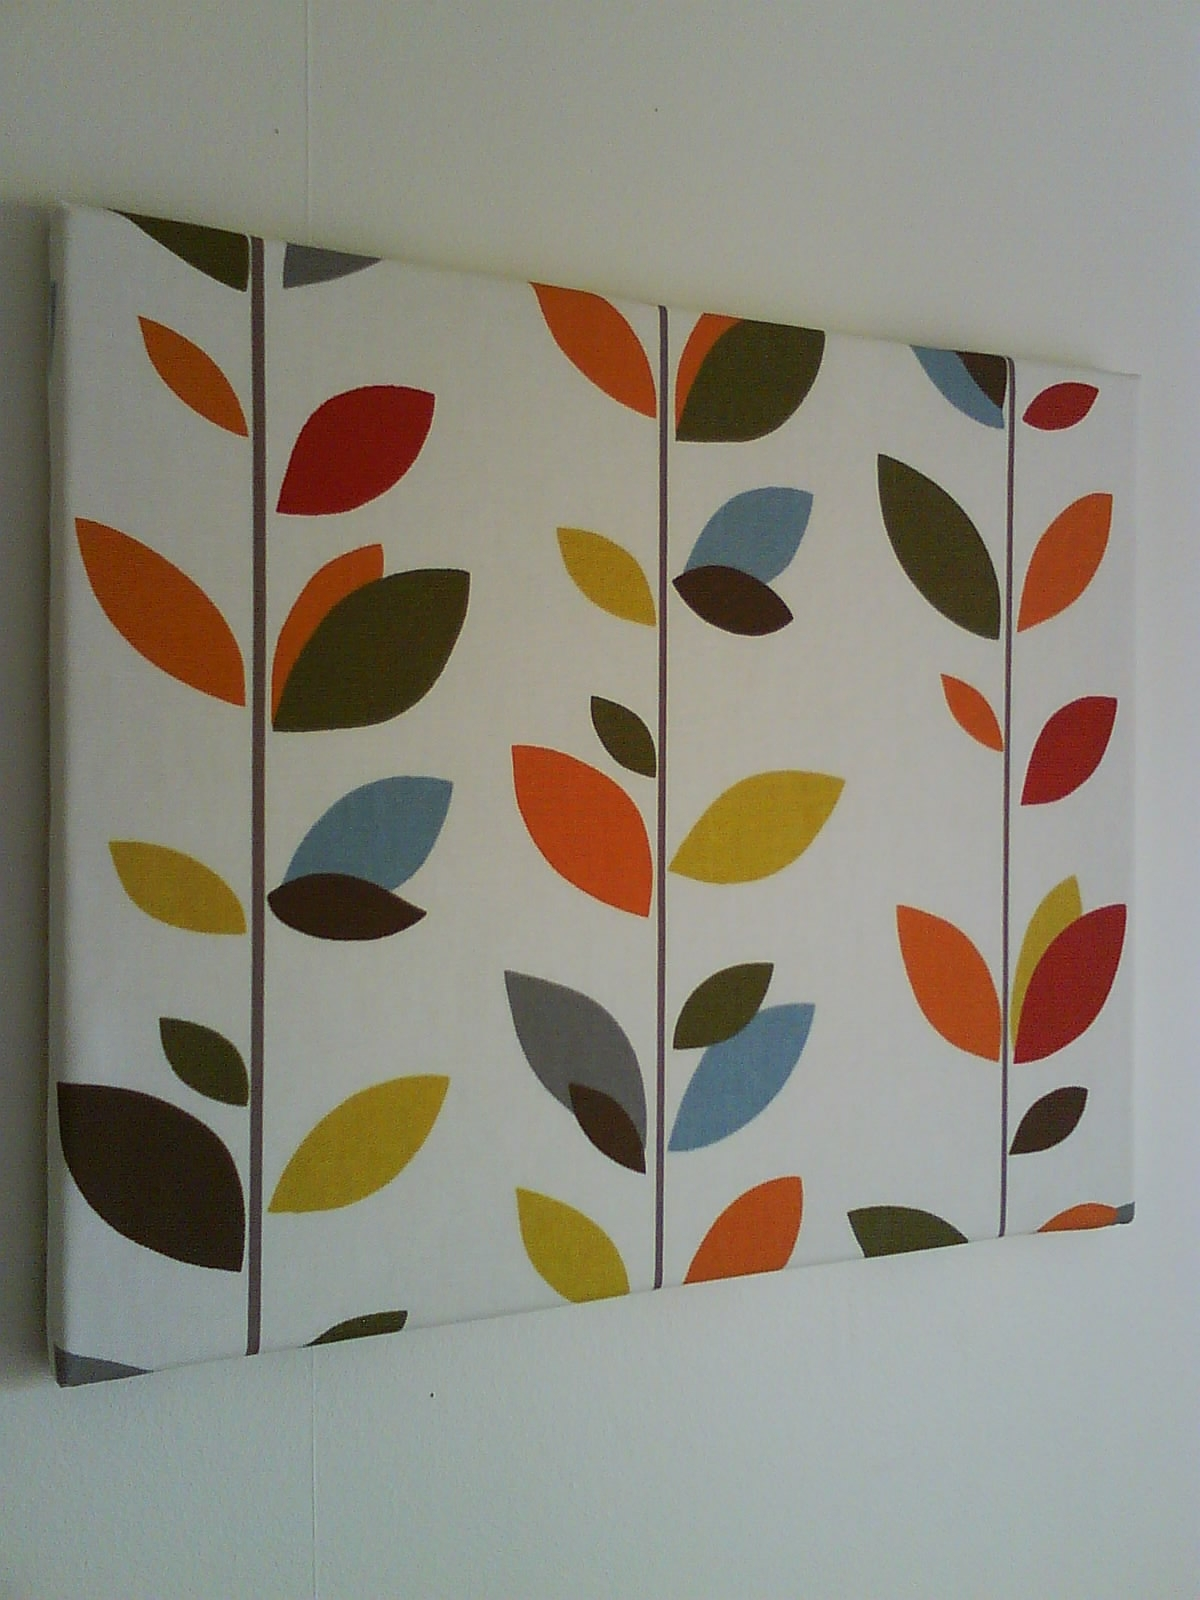 Popular Anminternational: Colourful Multi Stem Fabric Canvas Wall Art With Canvas Wall Art With Fabric (Gallery 12 of 15)